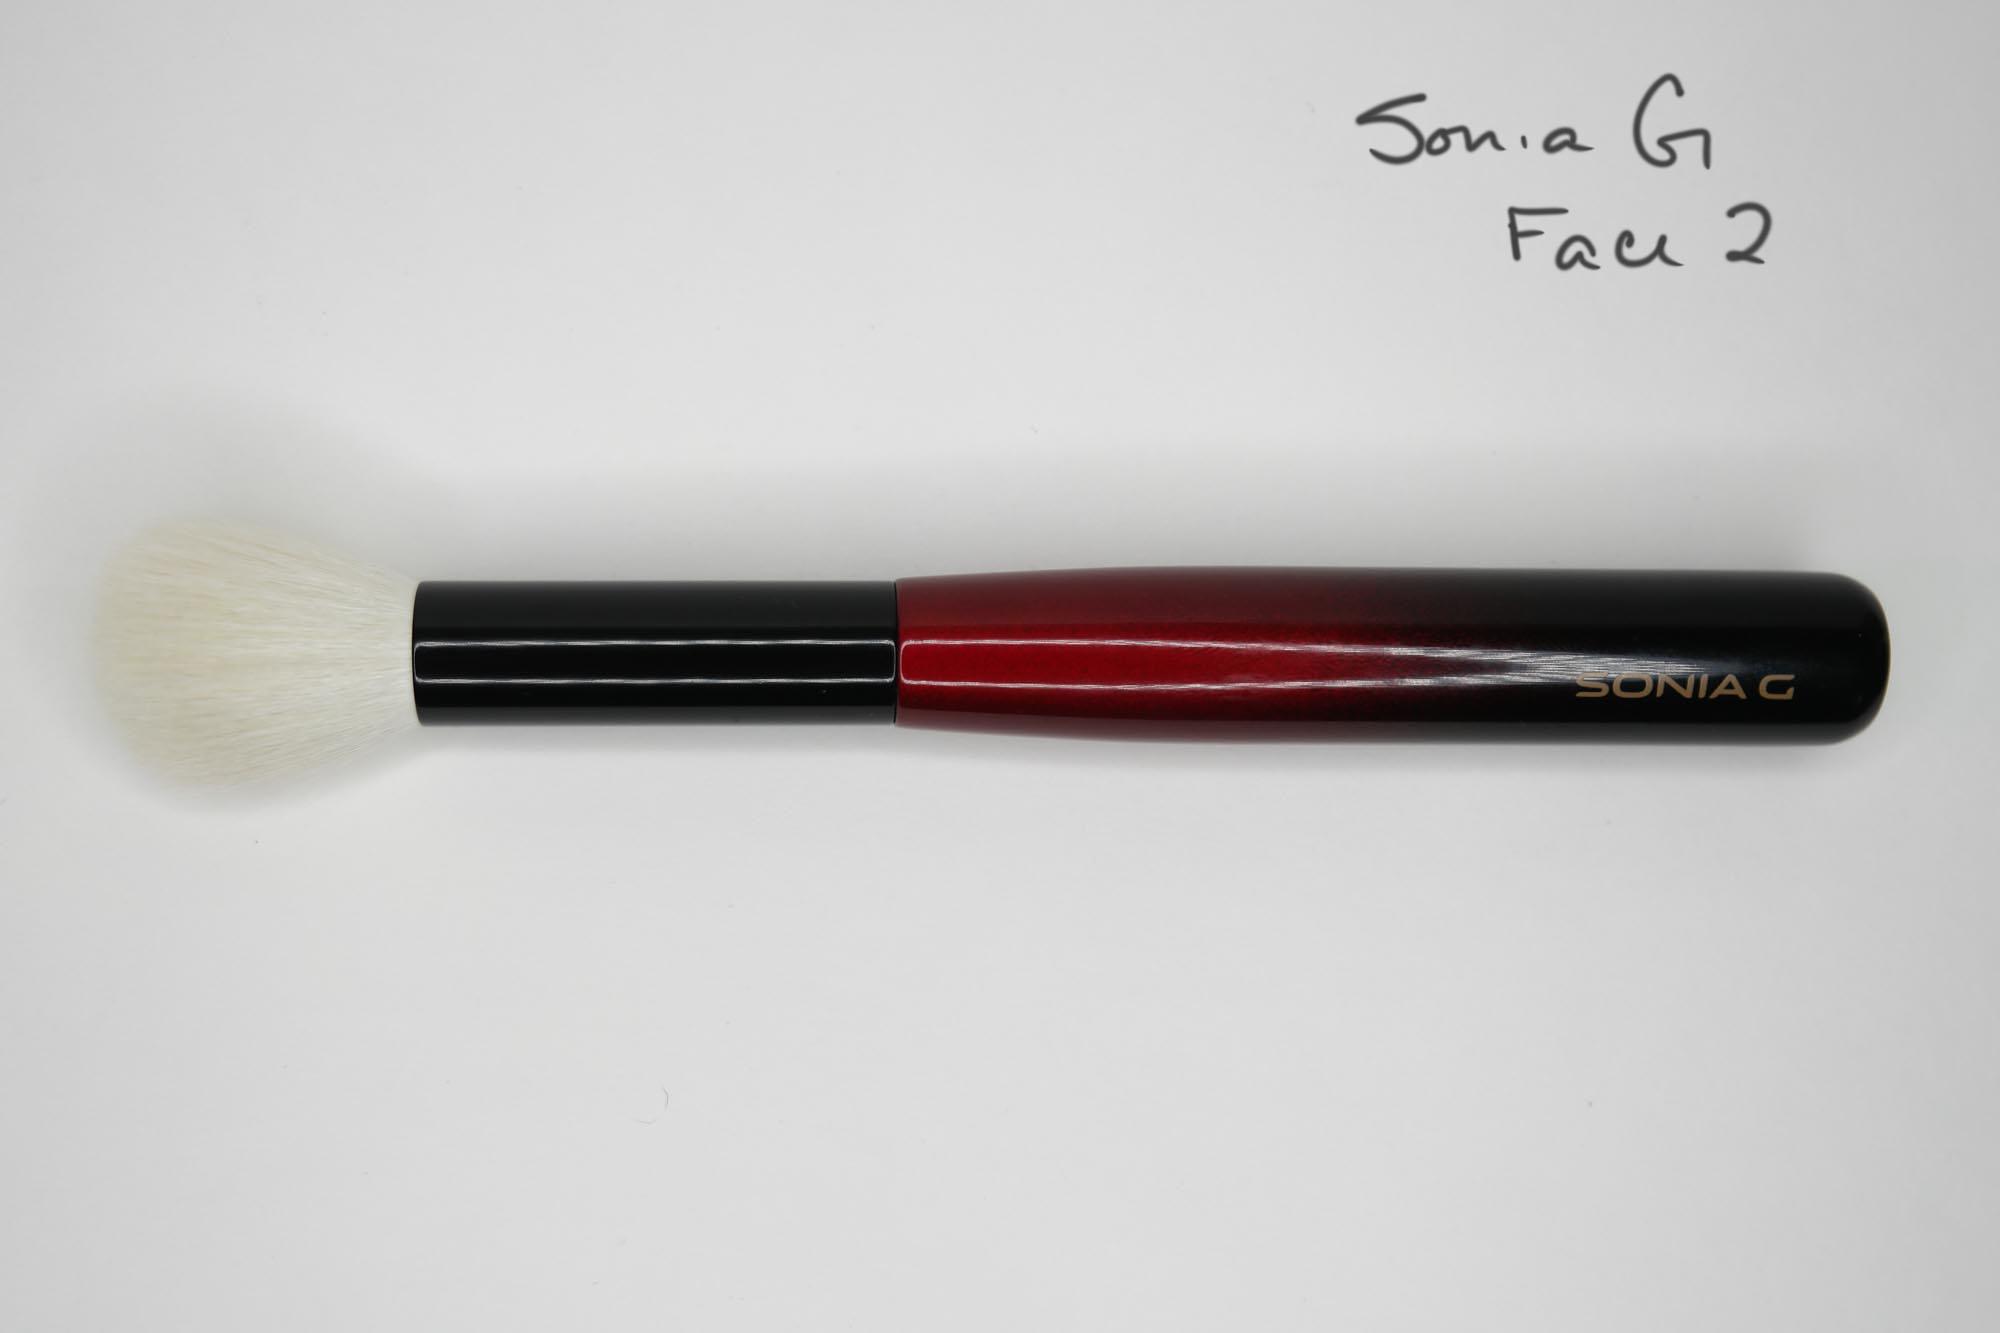 Sonia G Face 2